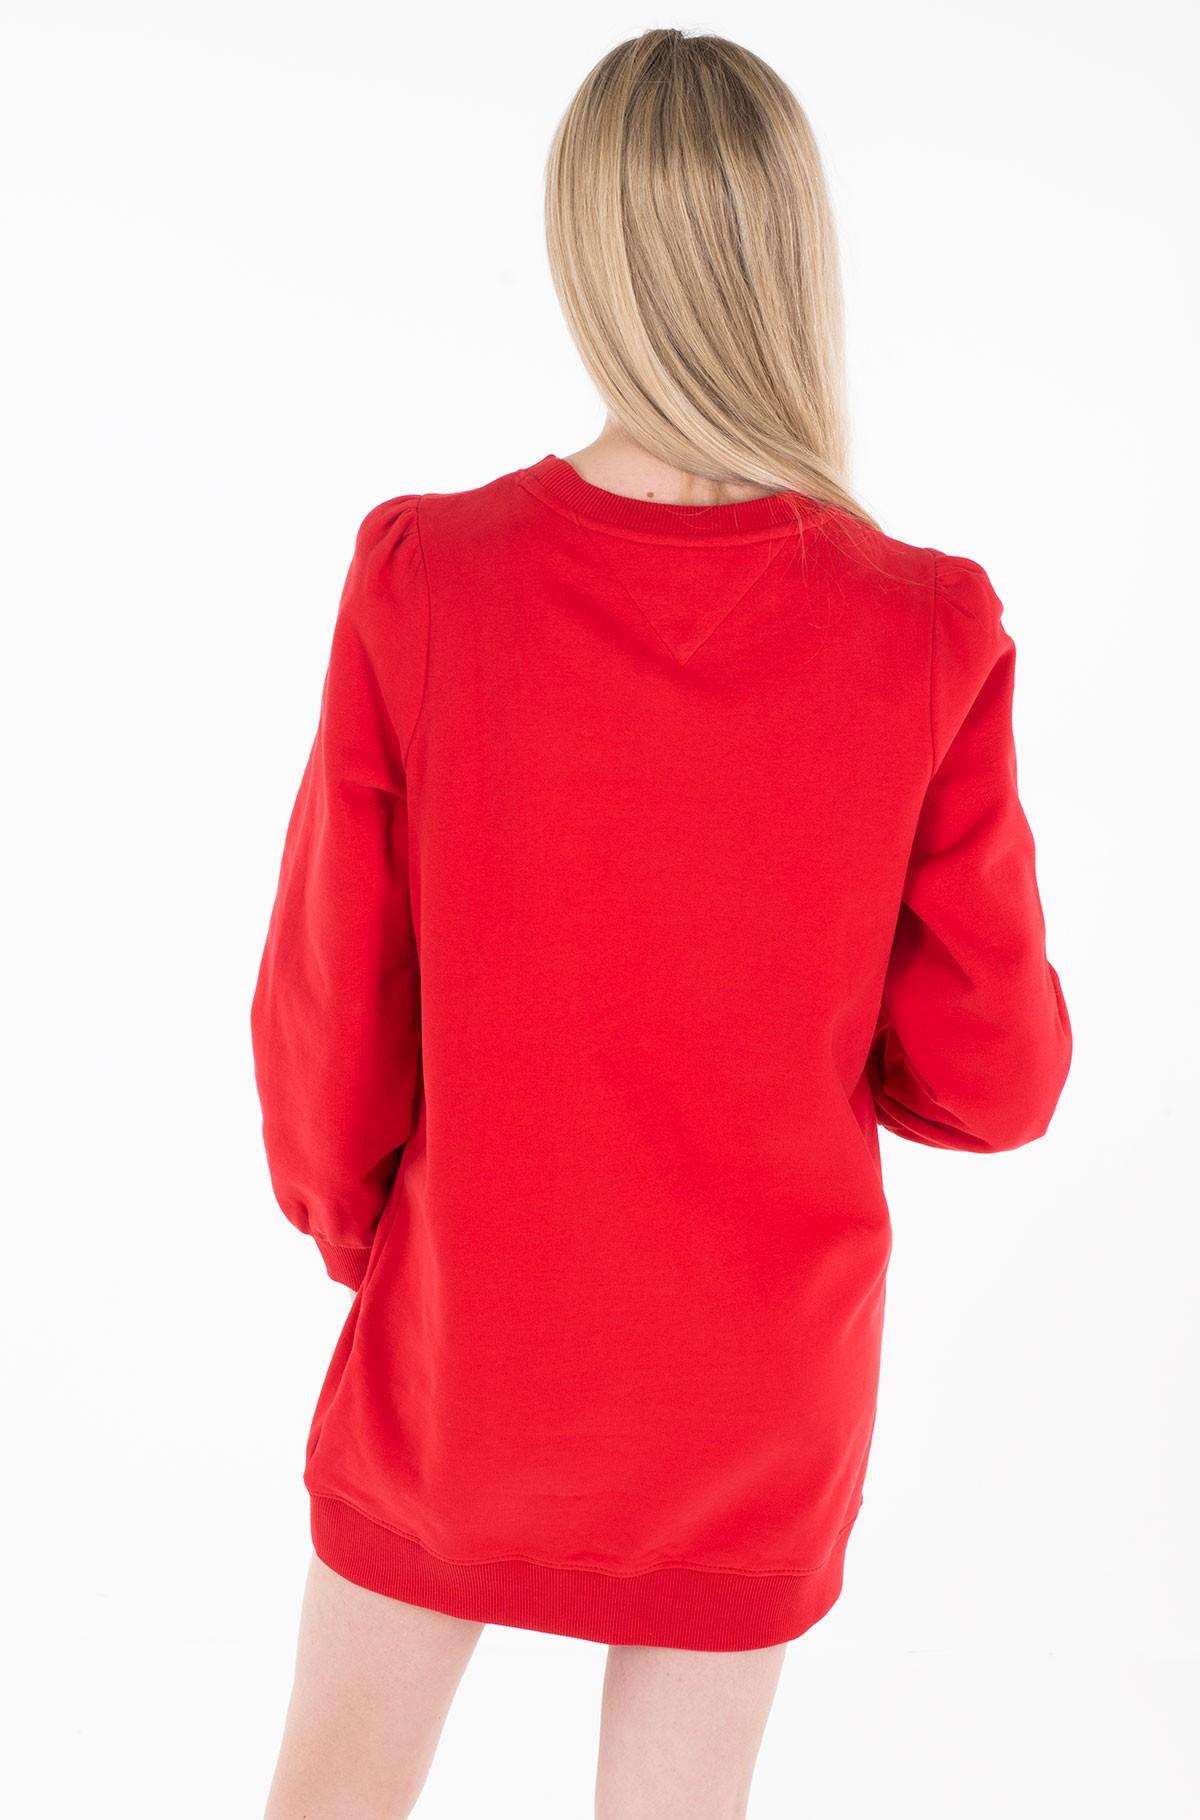 Sweatshirt dress TJW HEART LOGO SWEAT DRESS-full-4